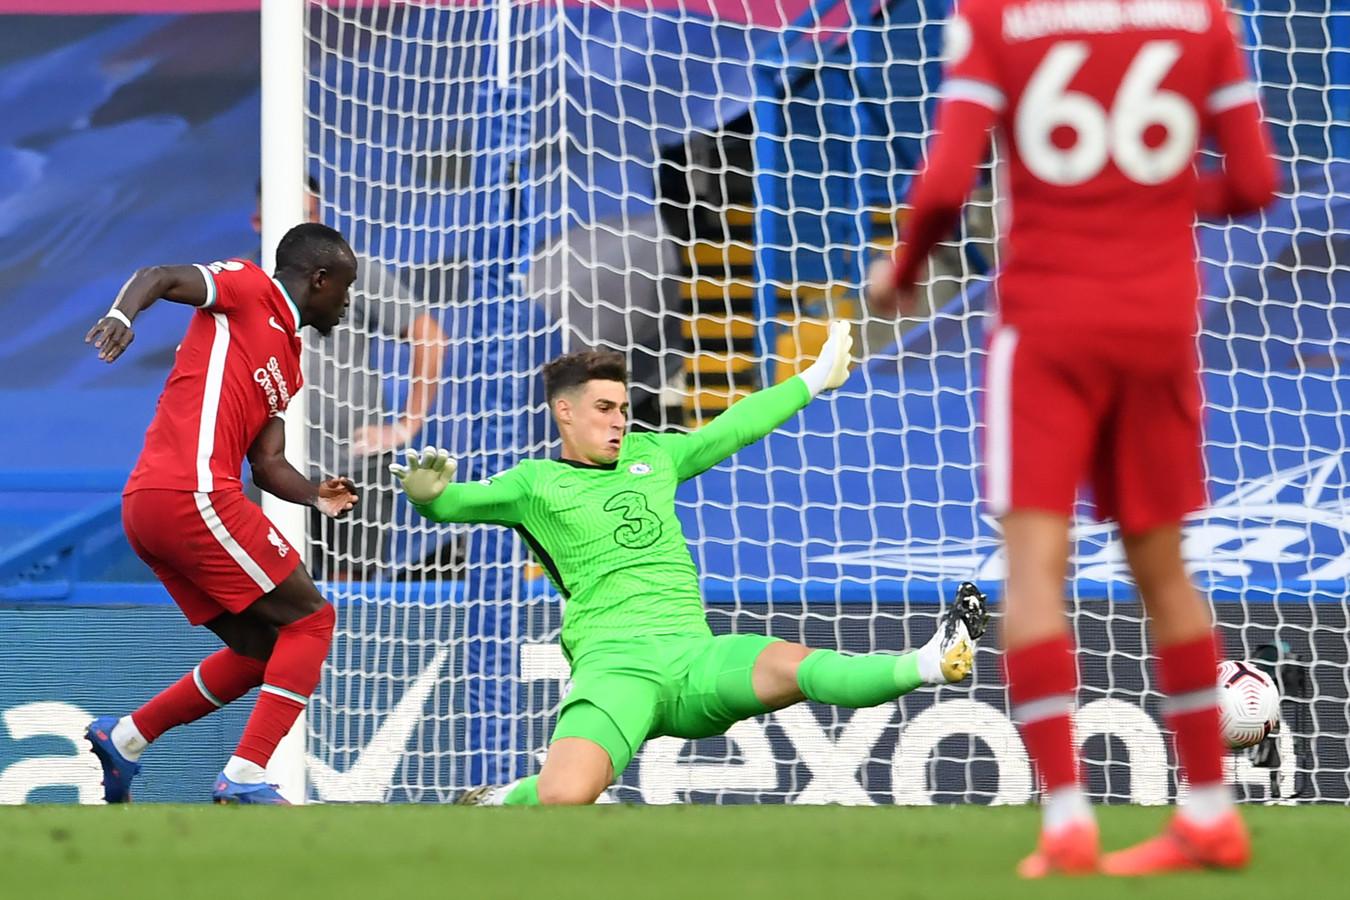 Sadio Mané schiet de 0-2 binnen na een afgrijselijke fout van Kepa Arrizabalaga.